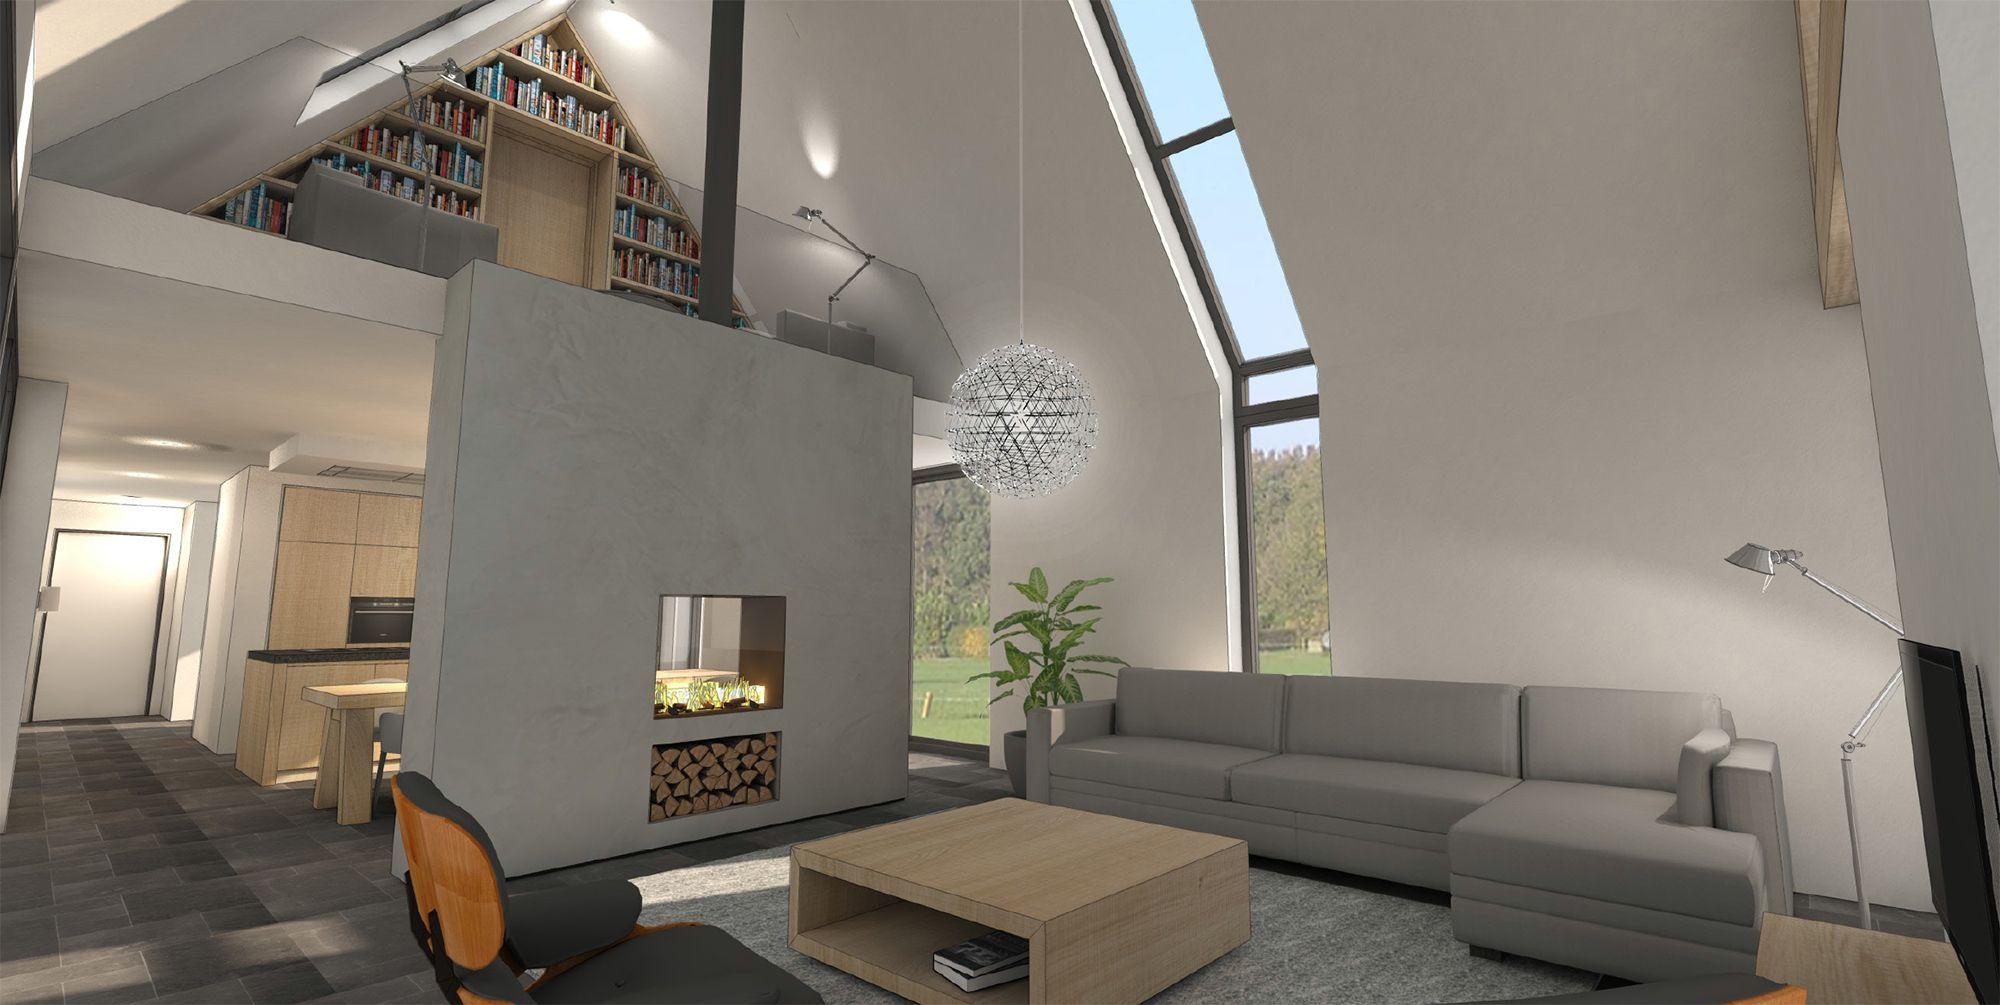 Woonkamer Met Vide : Woonkamer met vide beste inspiratie voor huis ontwerp te ideas